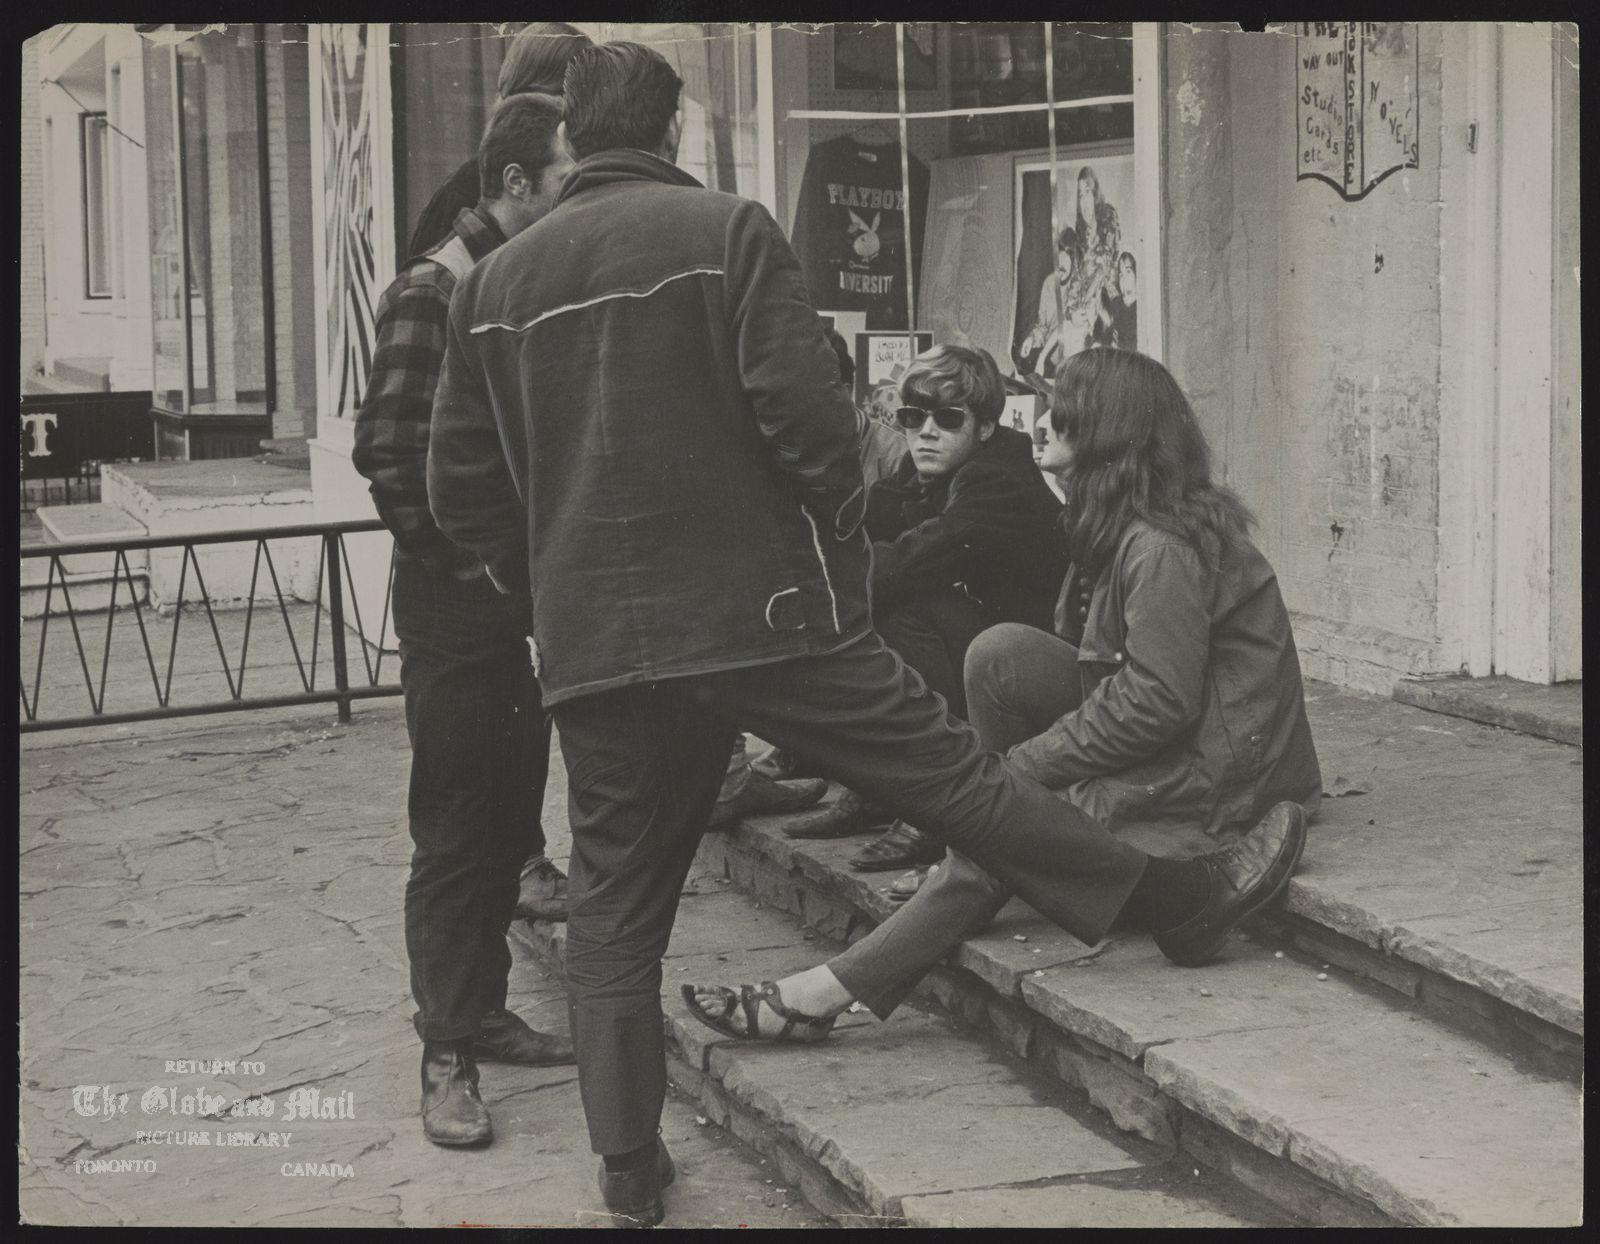 YORKVILLE Hippies conversing in Yorkville yesterday. Girls in teens vanish in the village.